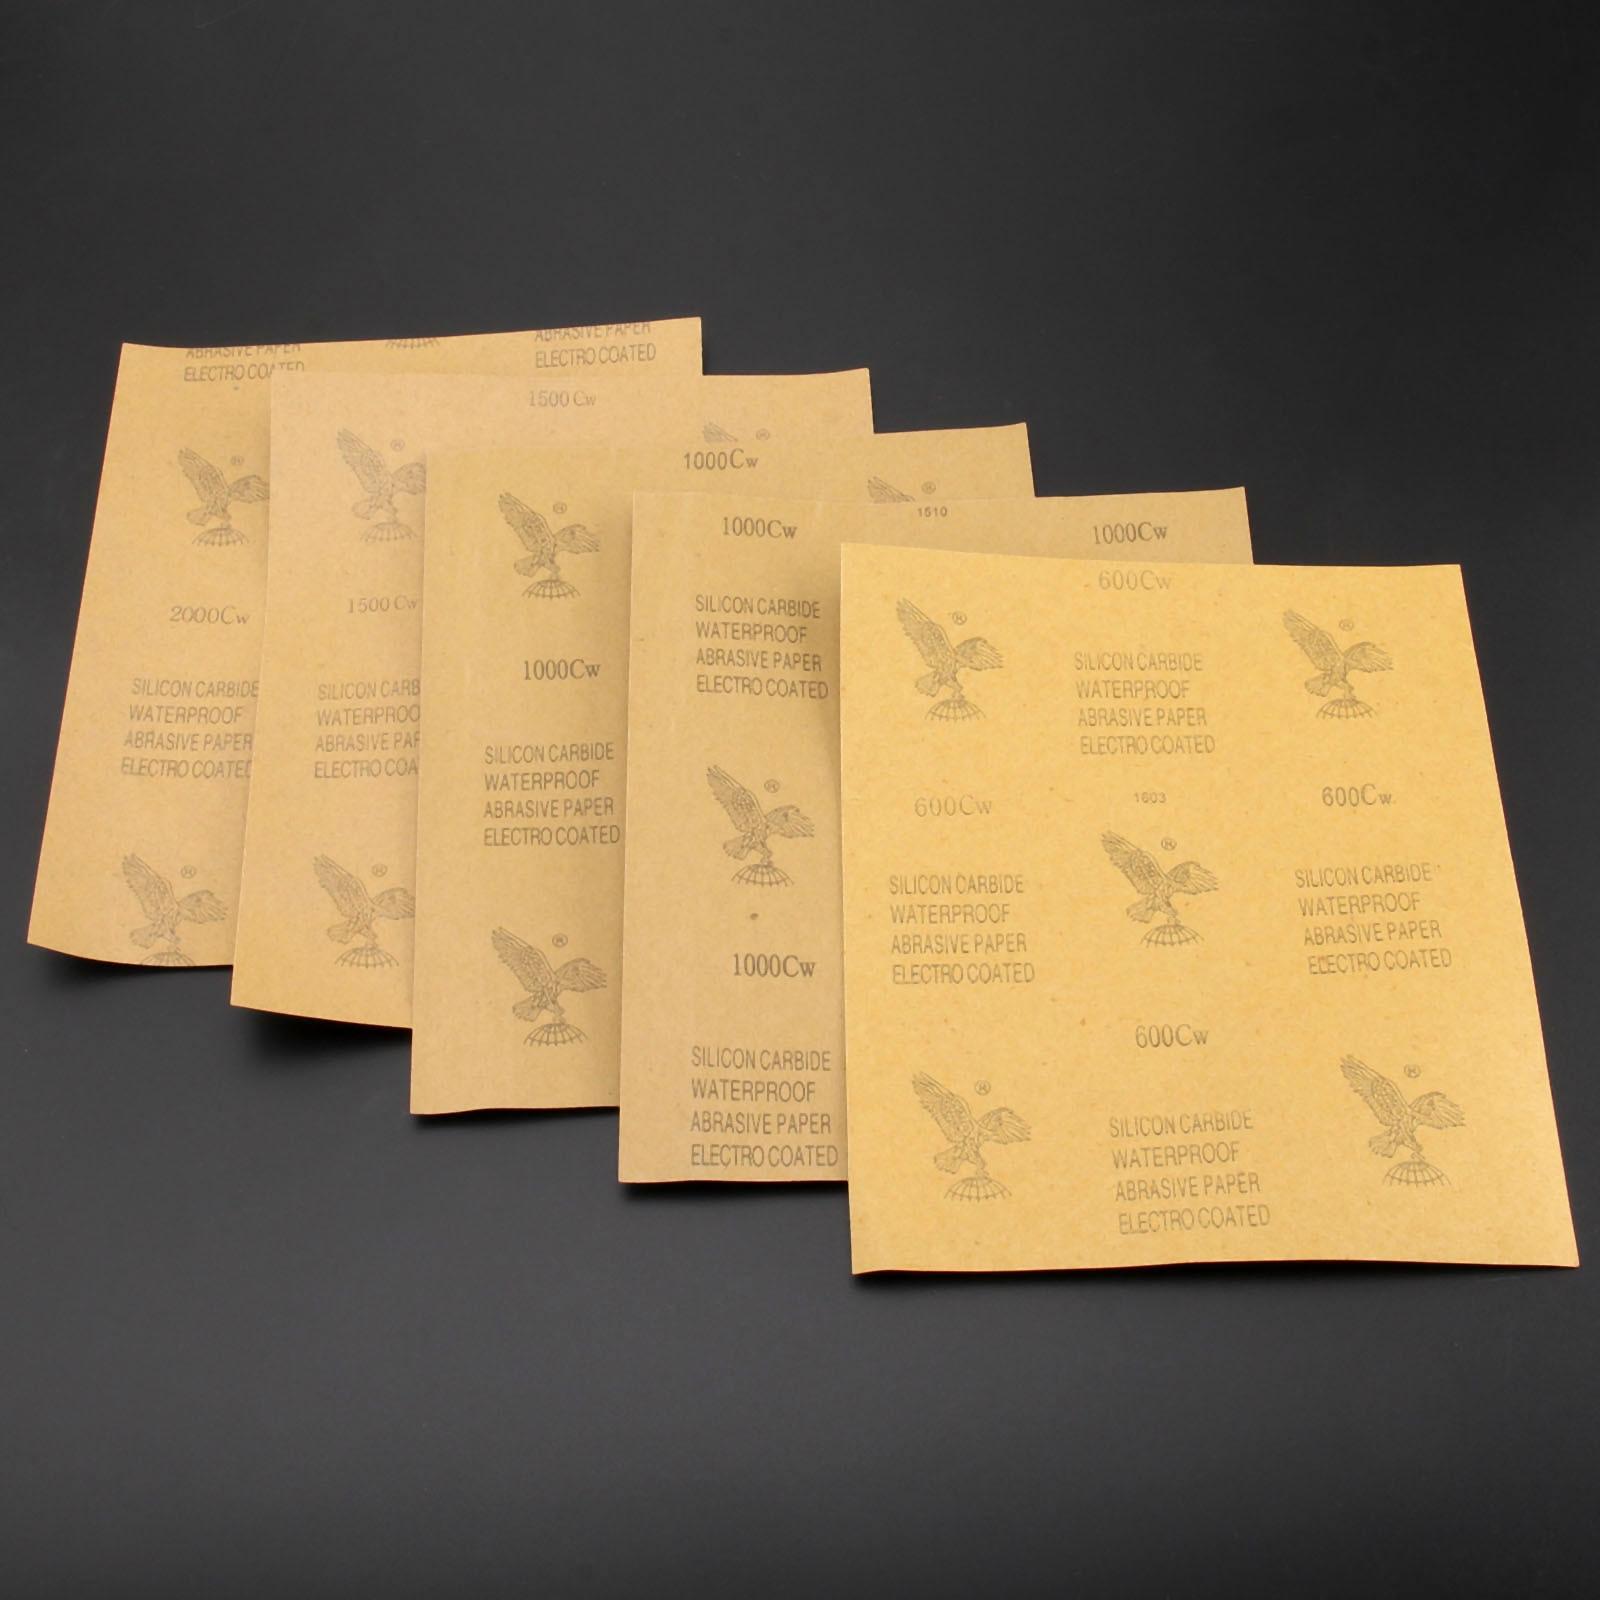 DRELD 5 fogli carta abrasiva impermeabile carta abrasiva carta - Utensili abrasivi - Fotografia 2